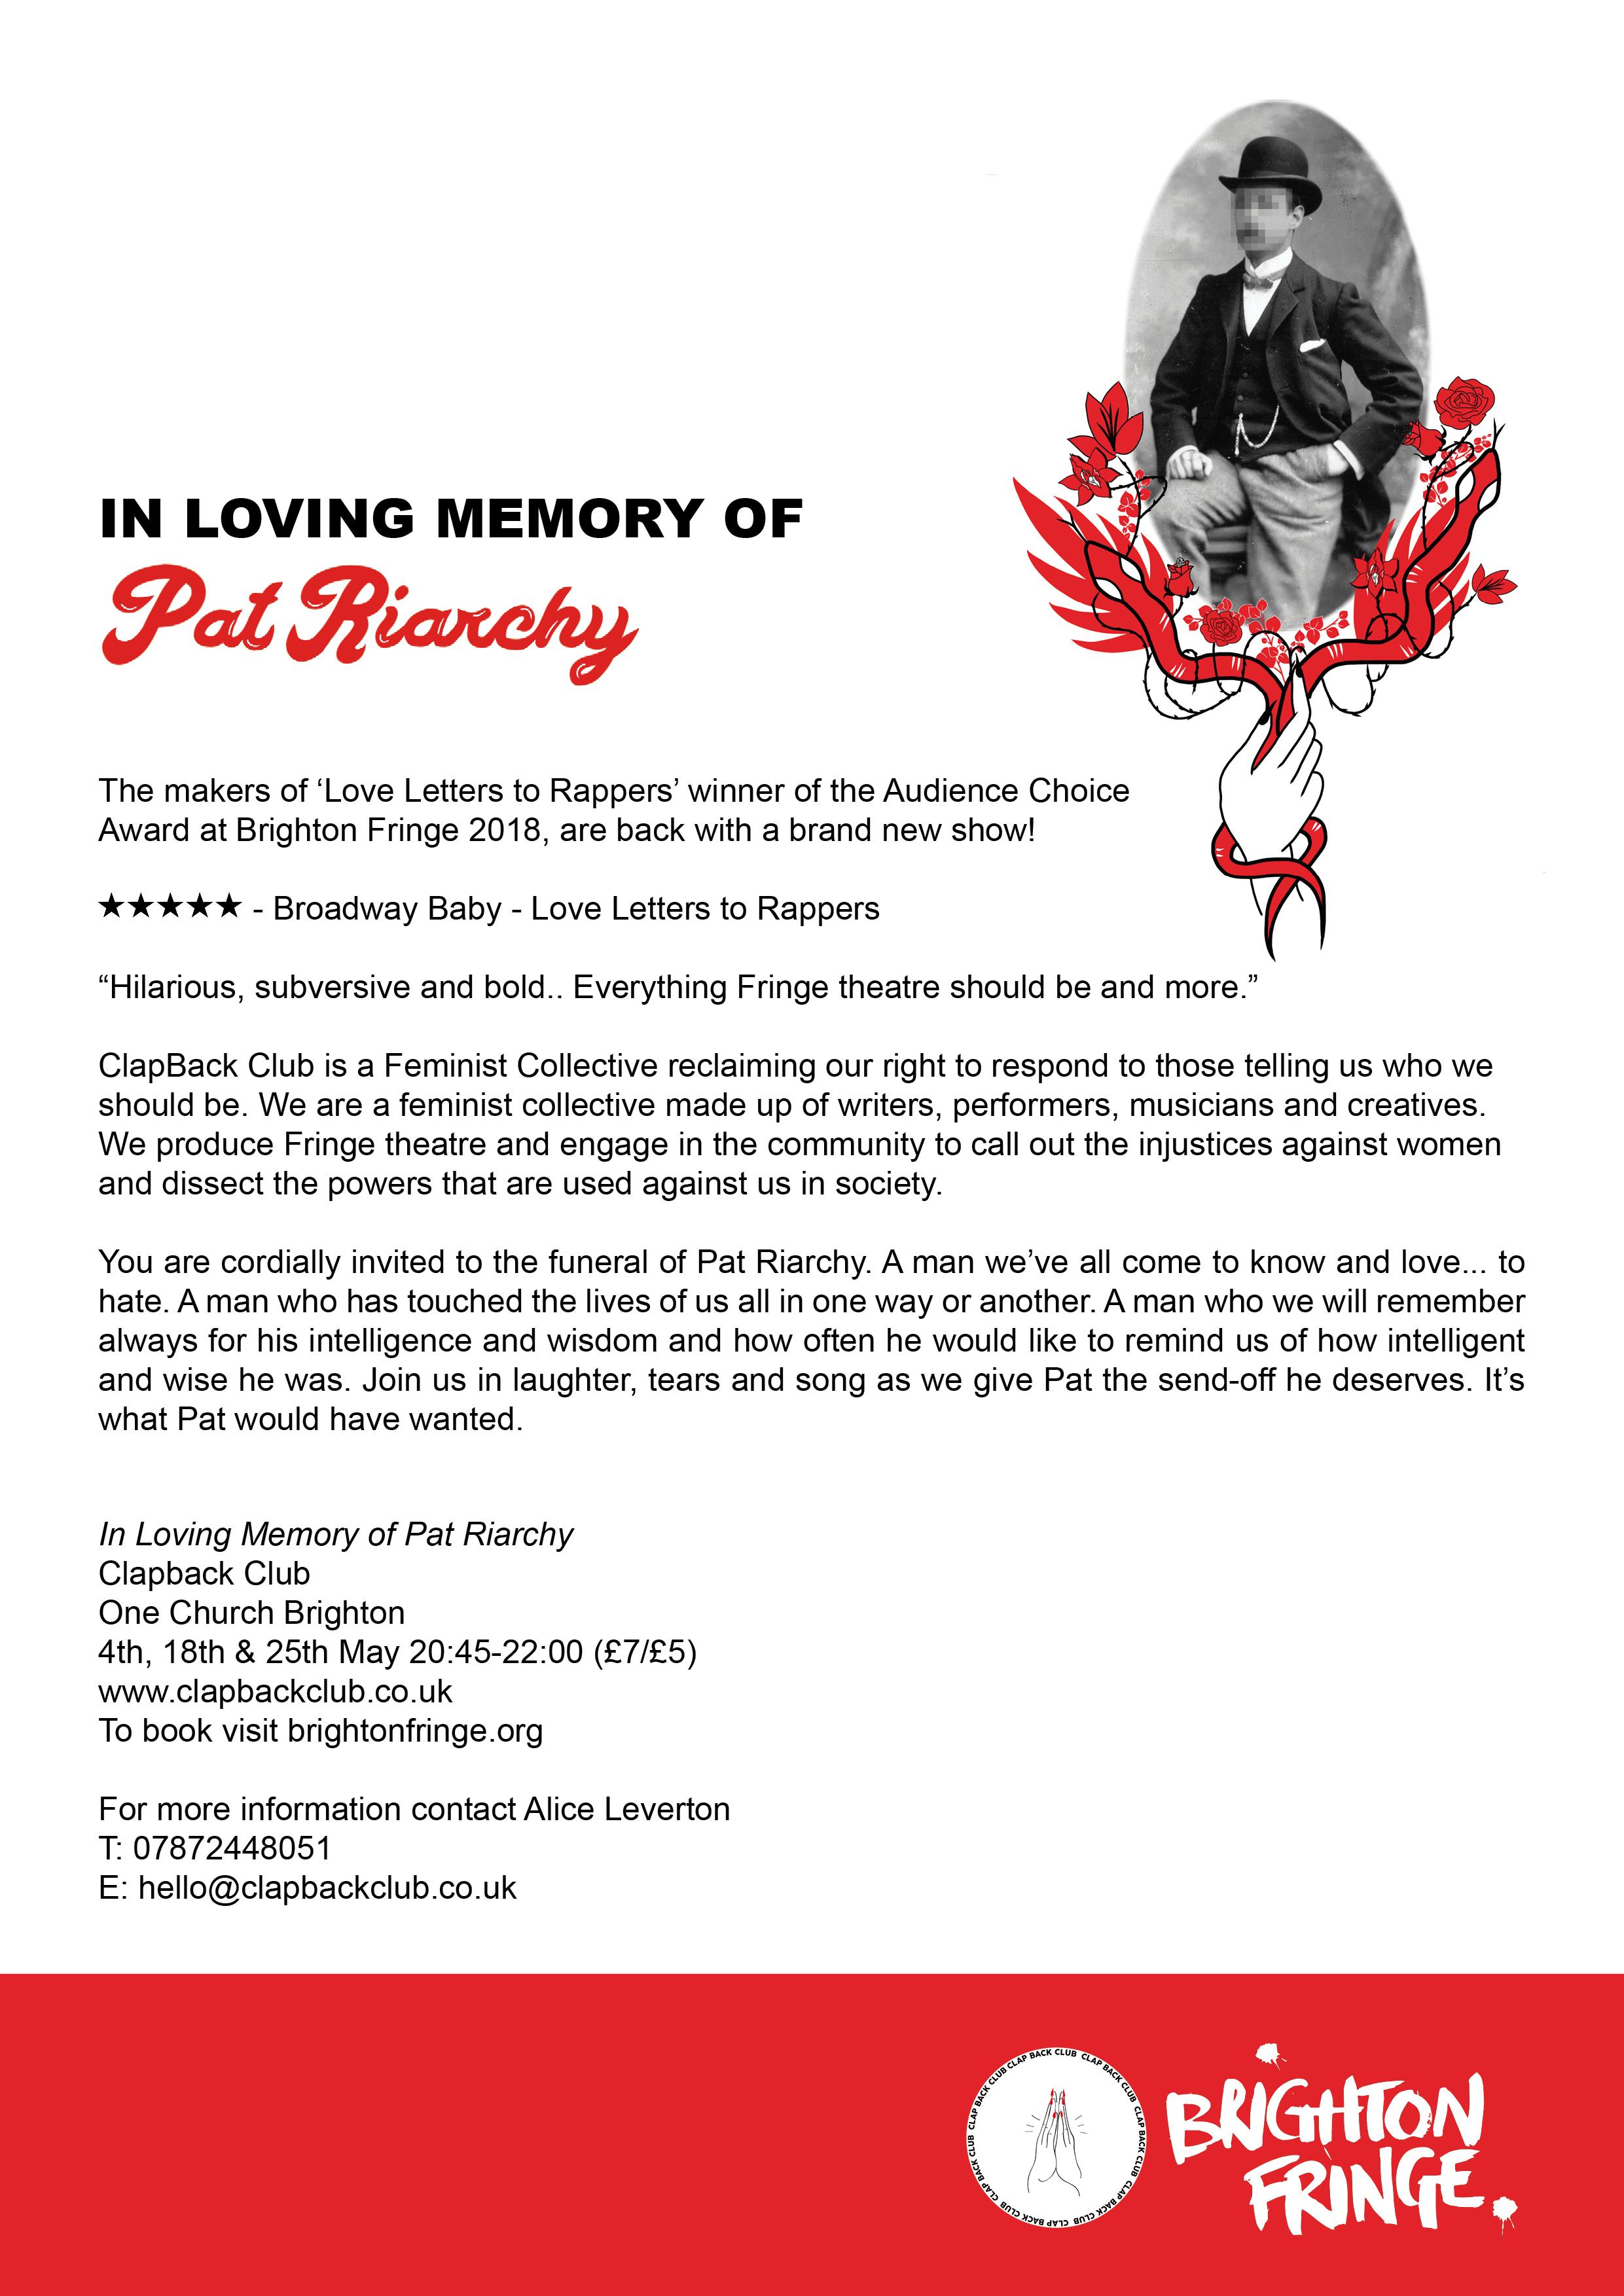 In Loving Memory of Patriarchy - press release.jpg